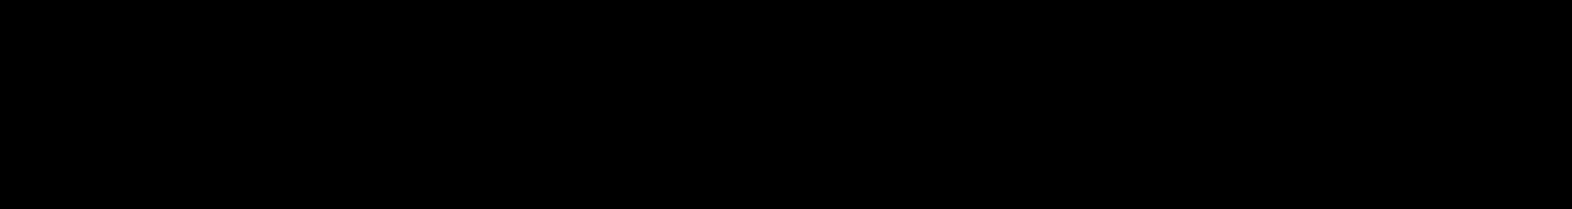 PW-标志-black